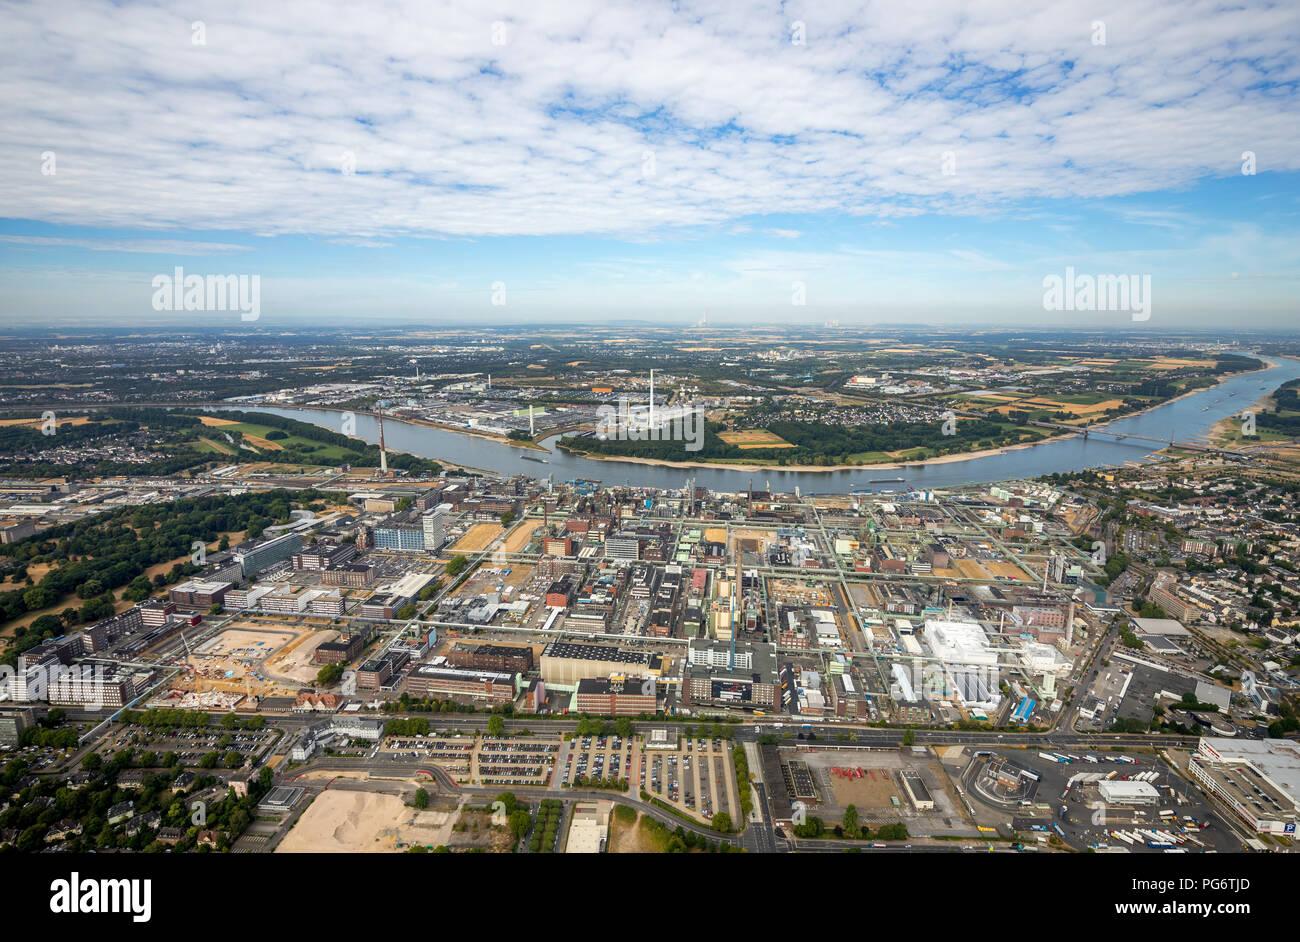 Bayer AG Plant, Rhine, pharmaceutical companies, Manfort, LANXESS Aktiengesellschaft, chemical plant, Leverkusen, Rhineland, North Rhine-Westphalia, G - Stock Image